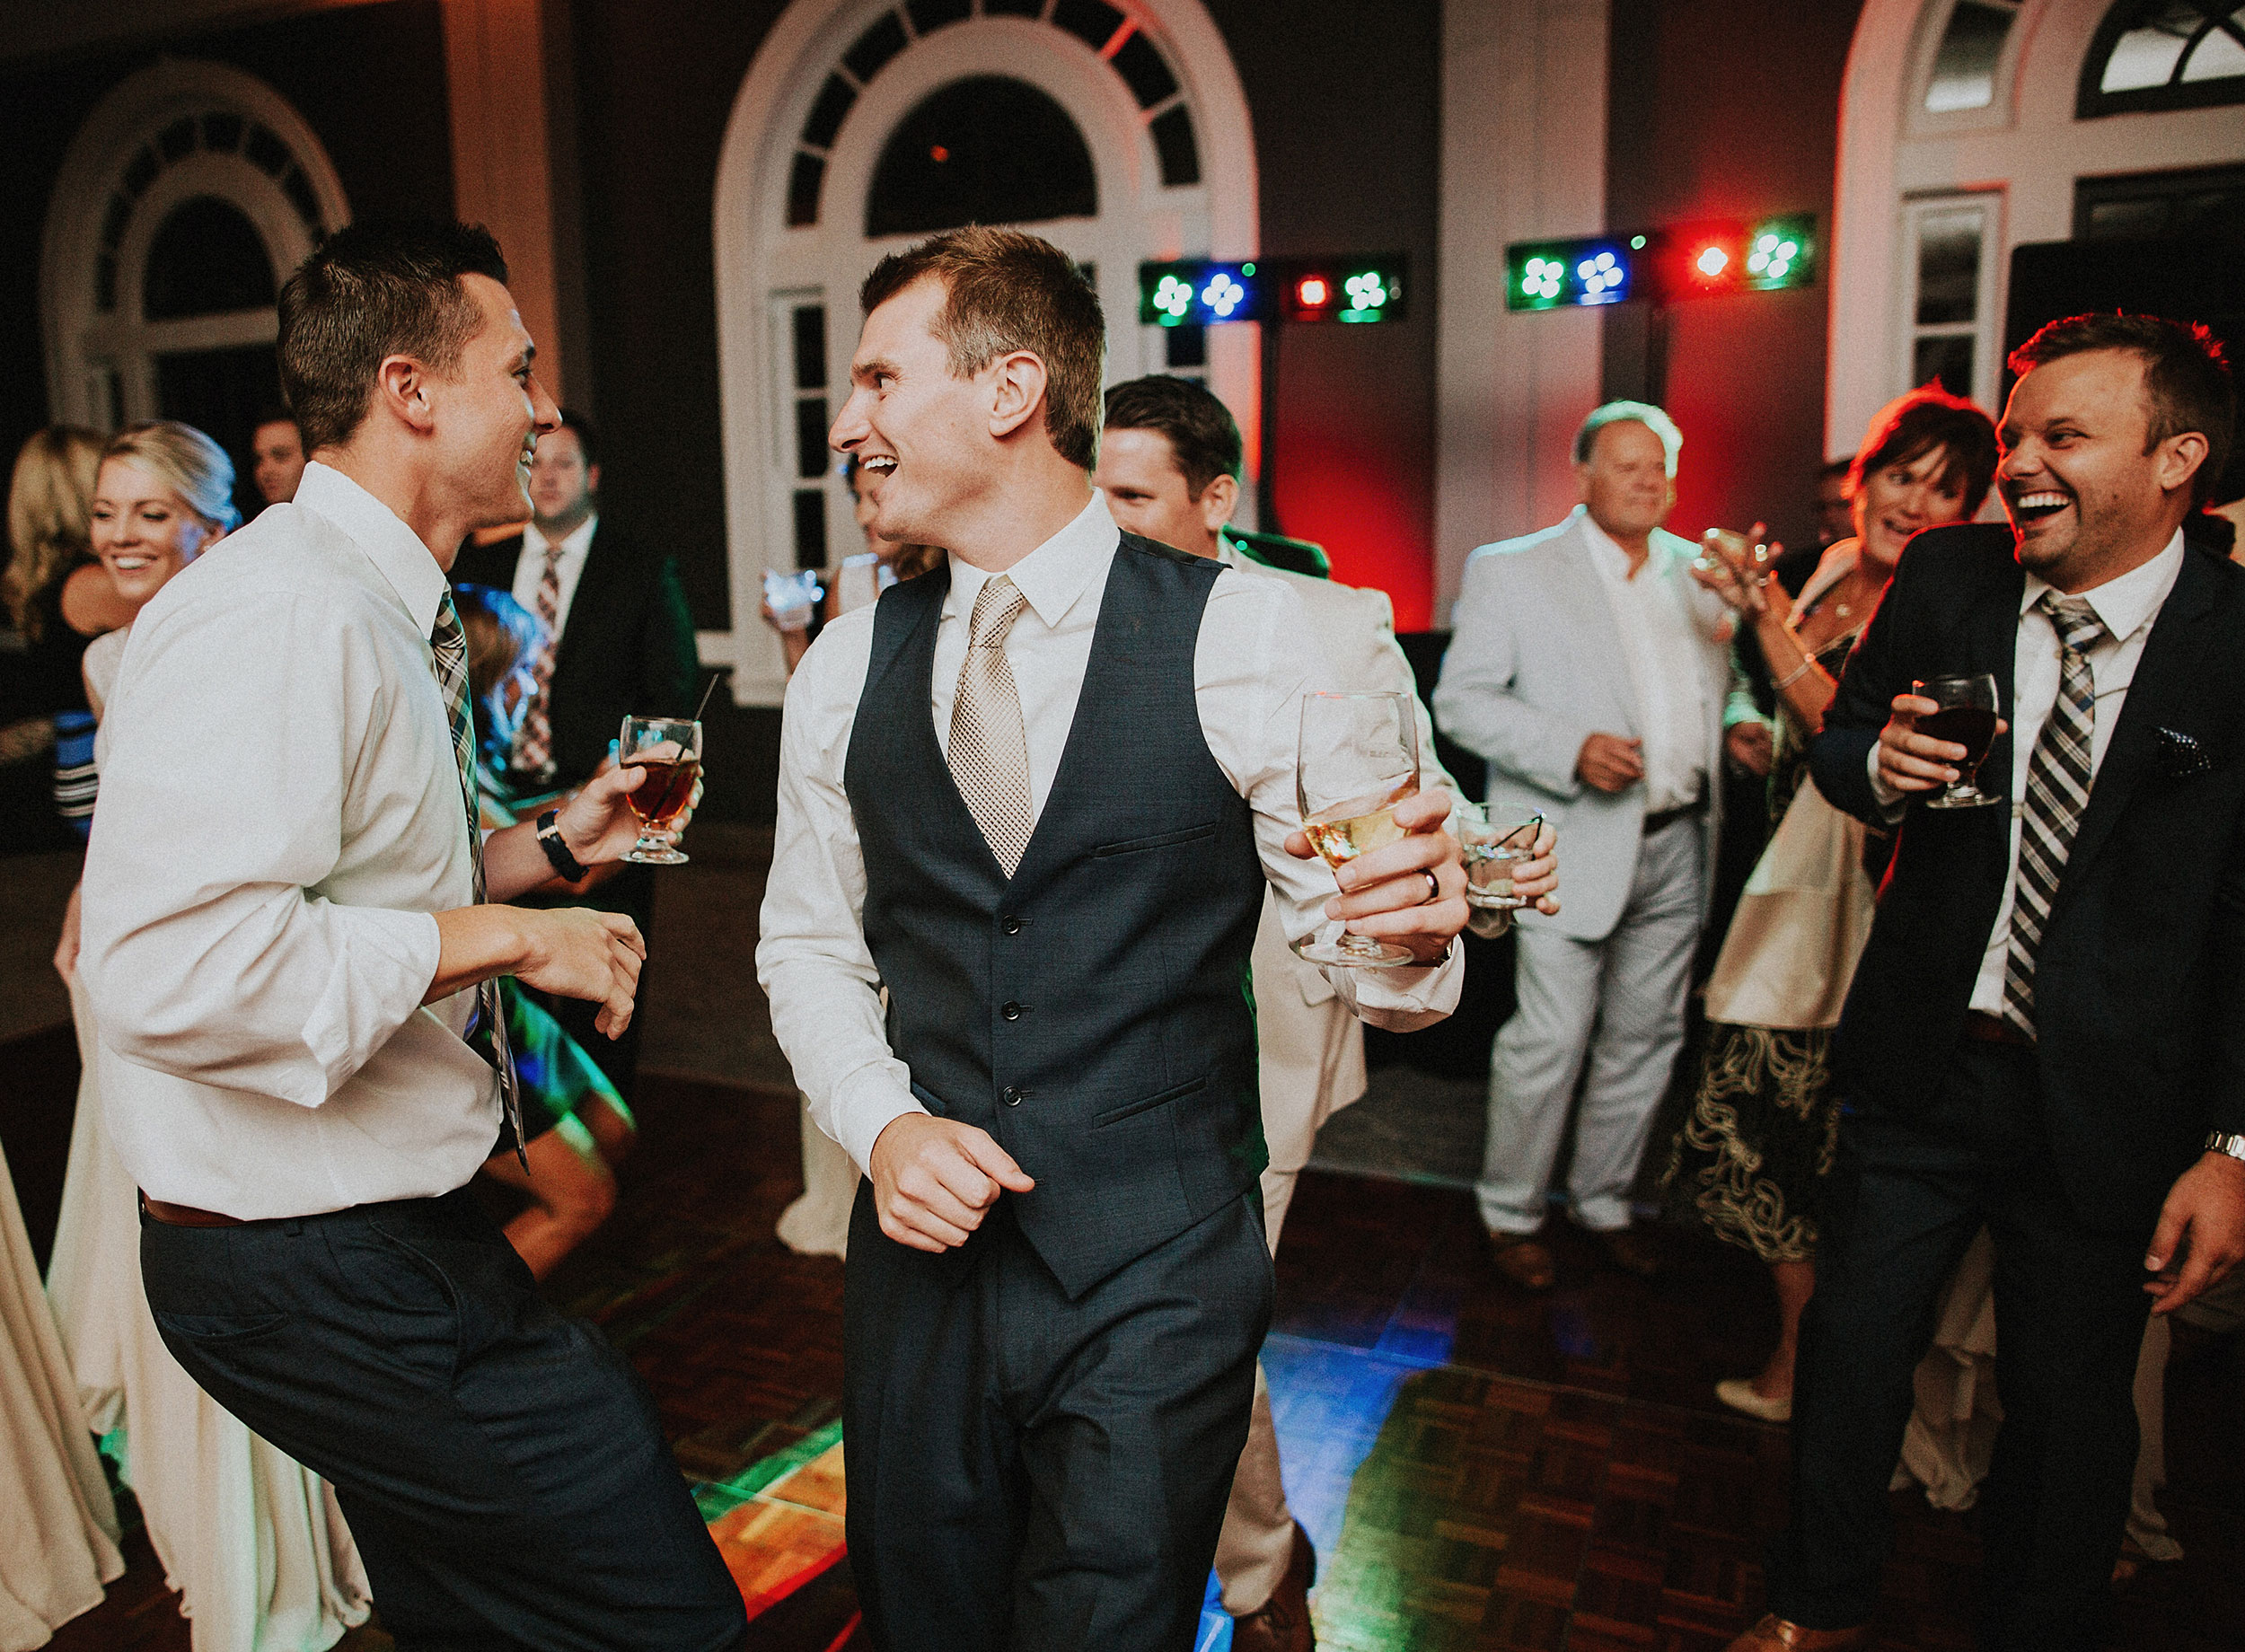 olmsted-wedding-louisville-kentucky-047.JPG